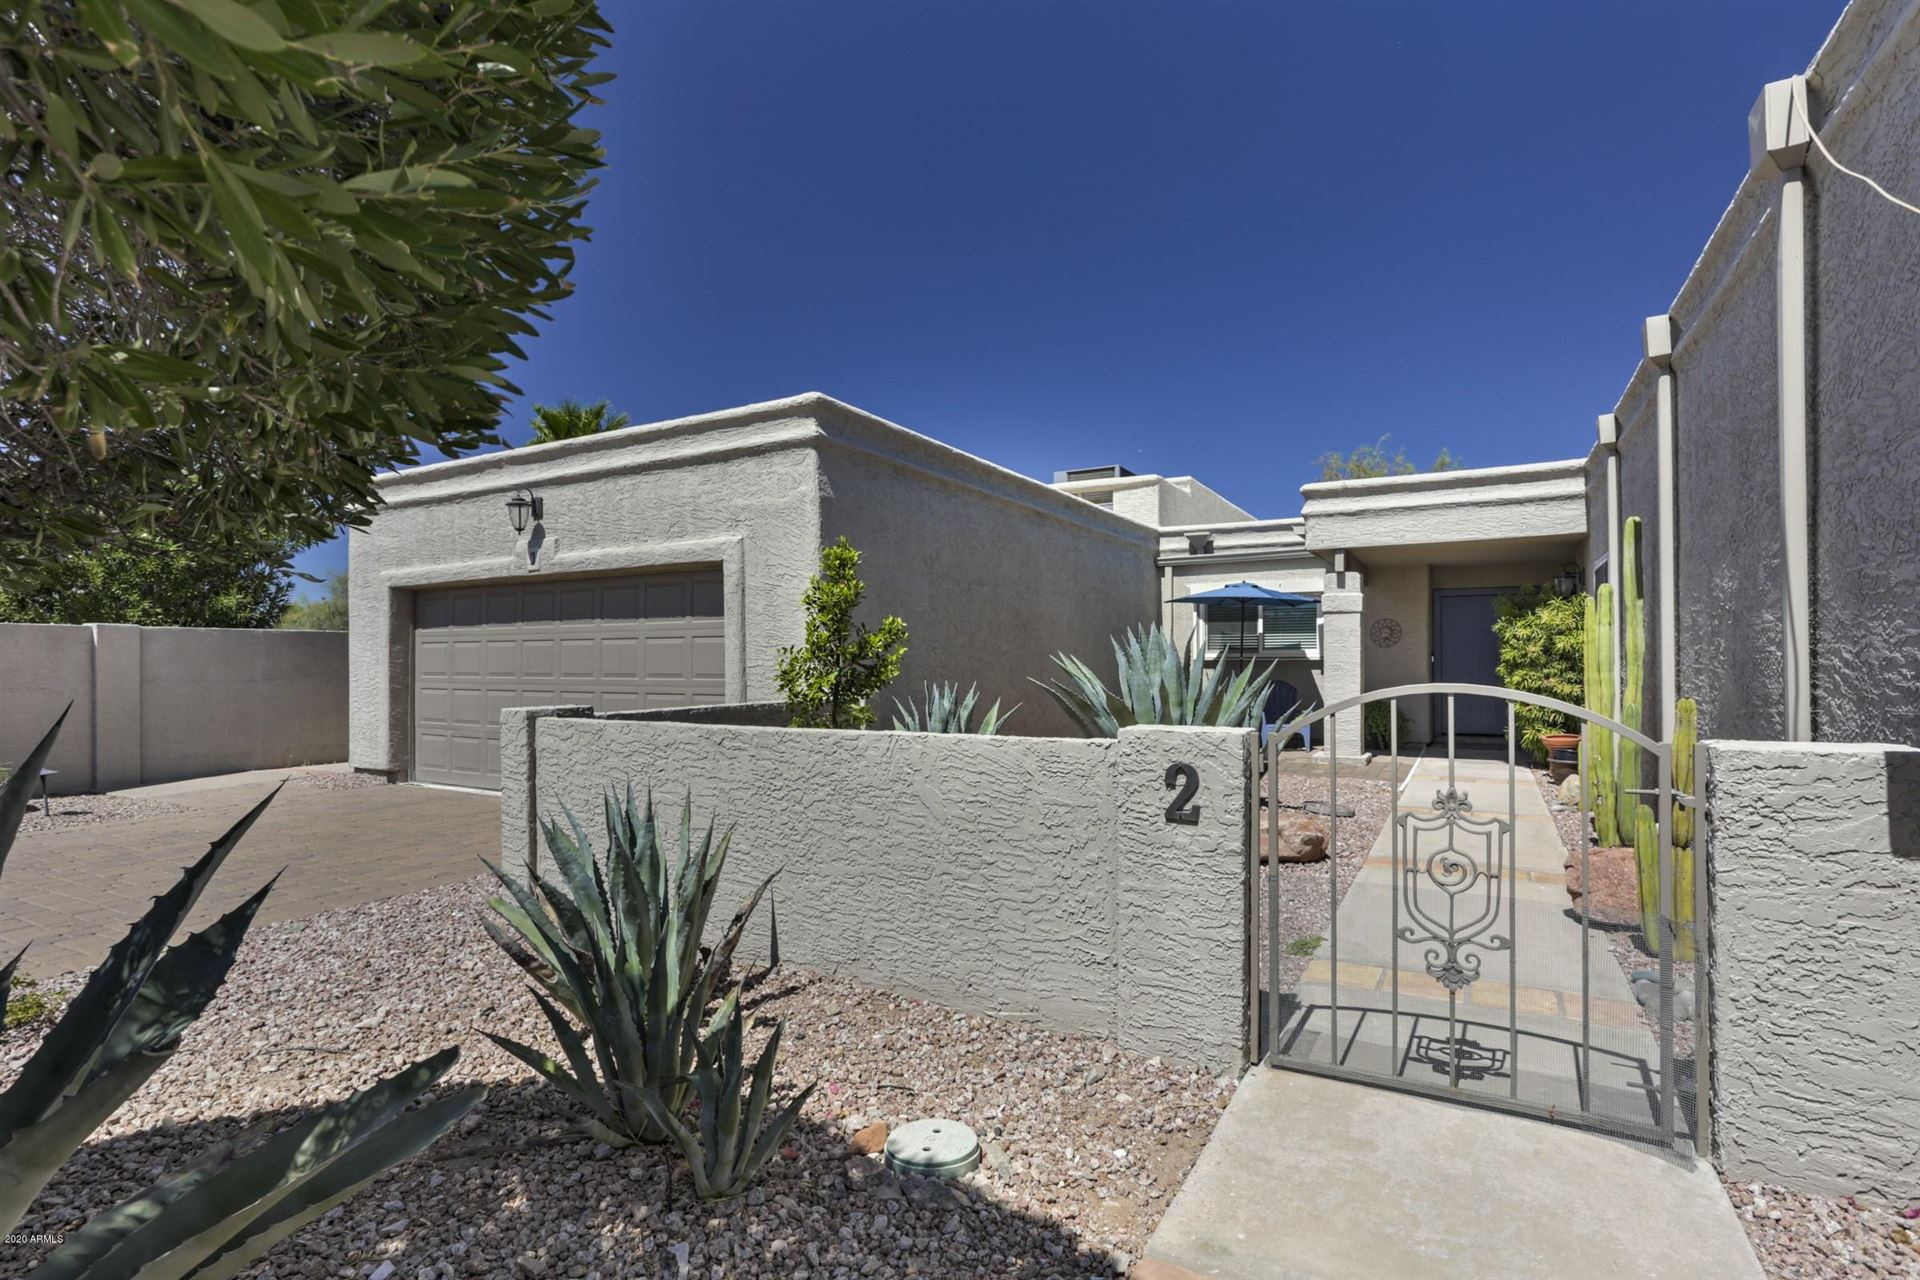 16111 E KINGSTREE Boulevard #2, Fountain Hills, AZ 85268 - MLS#: 6126481